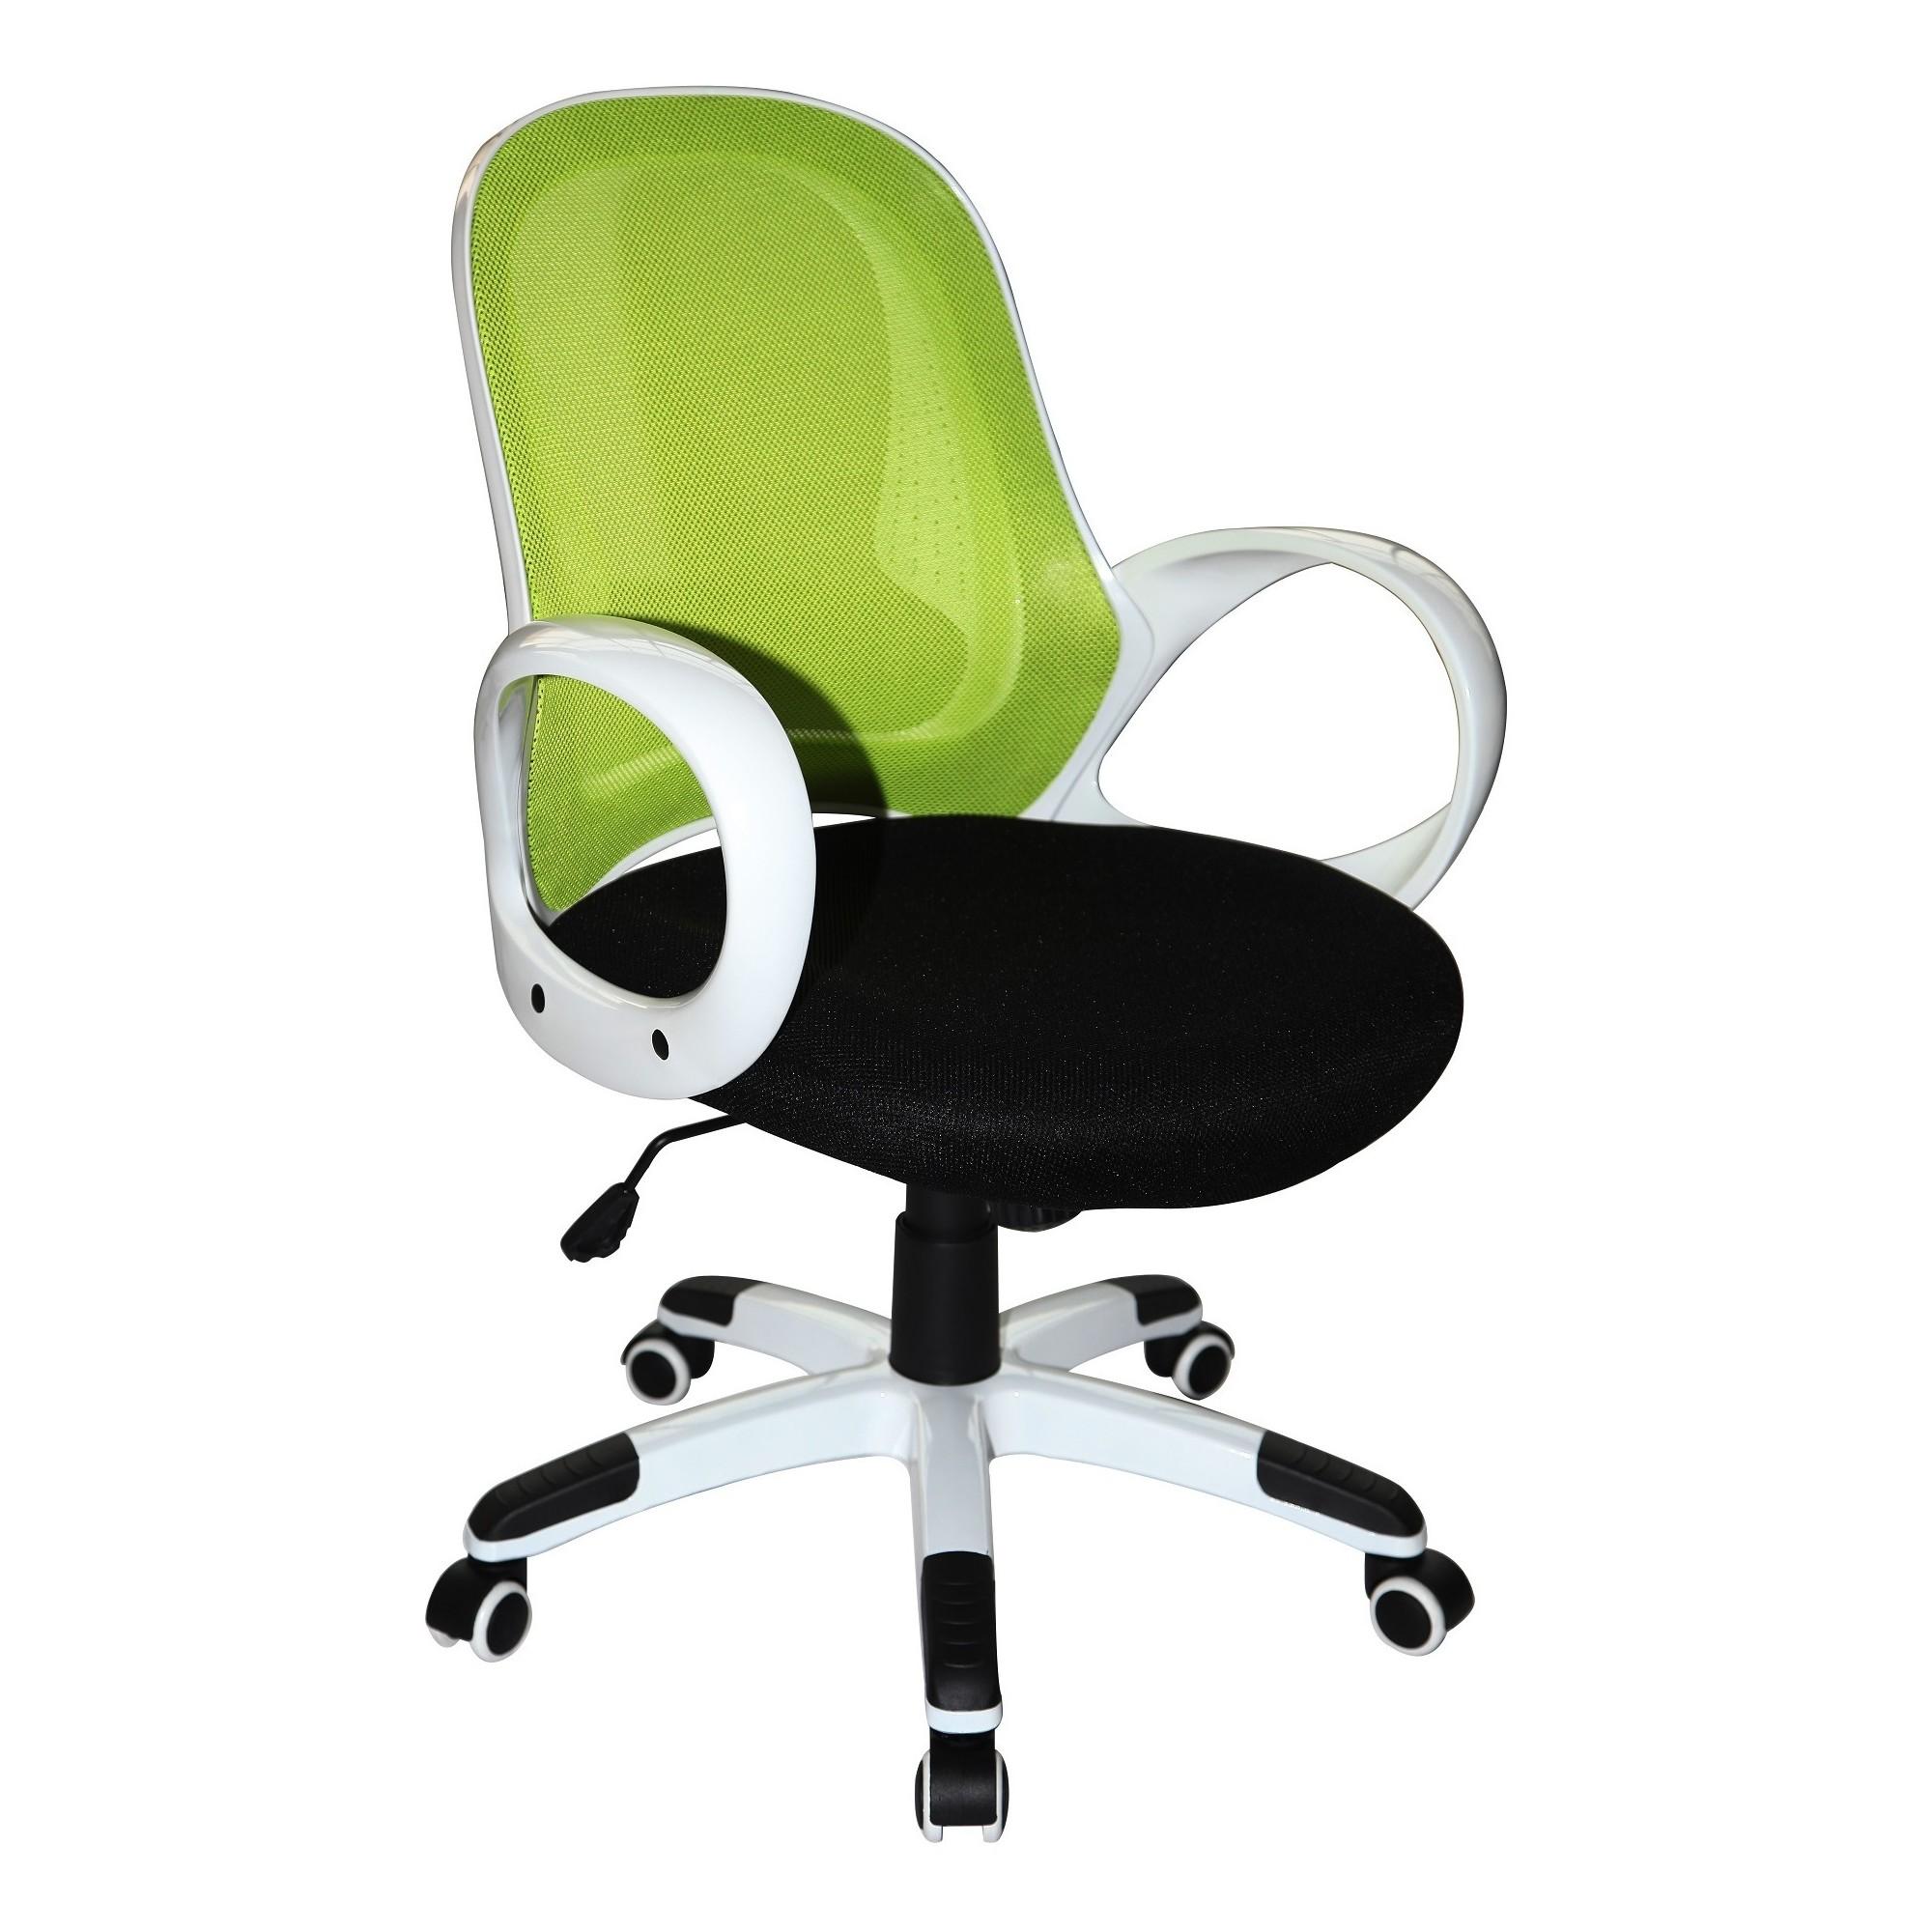 Miraculous Nelson Office Chair Lime Green White Black Boraam Black Uwap Interior Chair Design Uwaporg